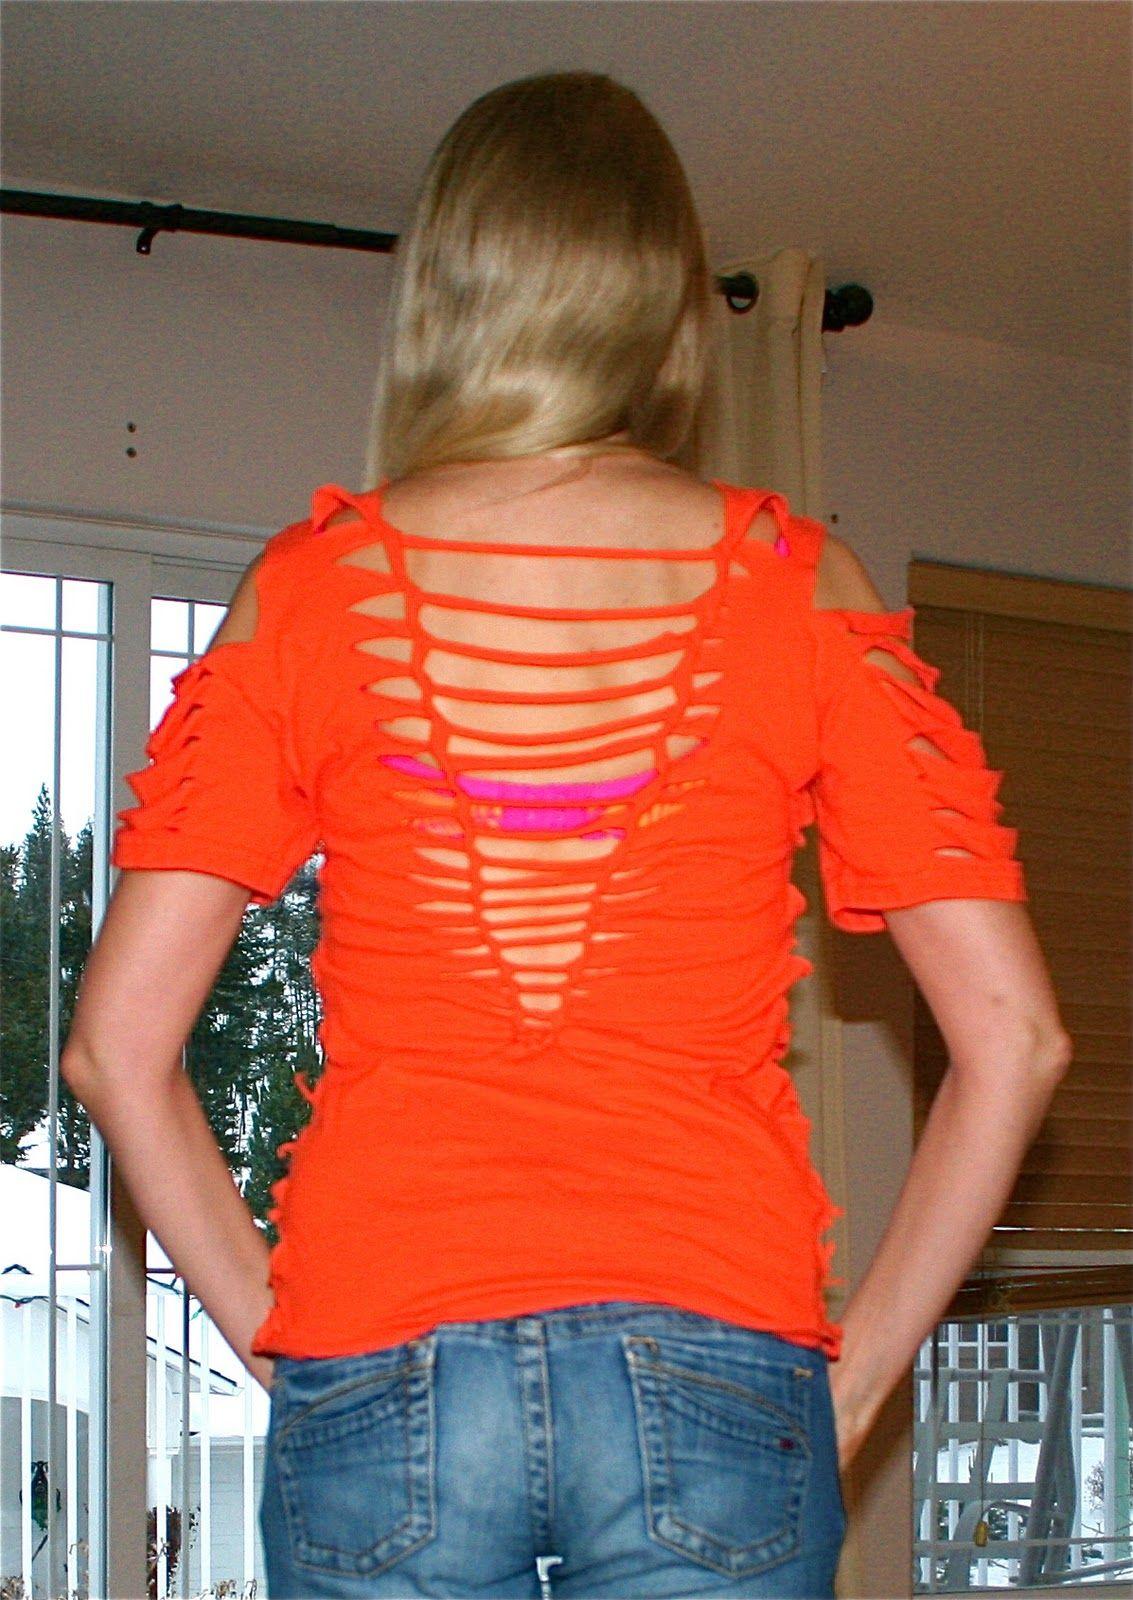 T-shirt design for zumba - Cute Ways To Cut A T Shirt Cool Cut Up T Shirt Musings